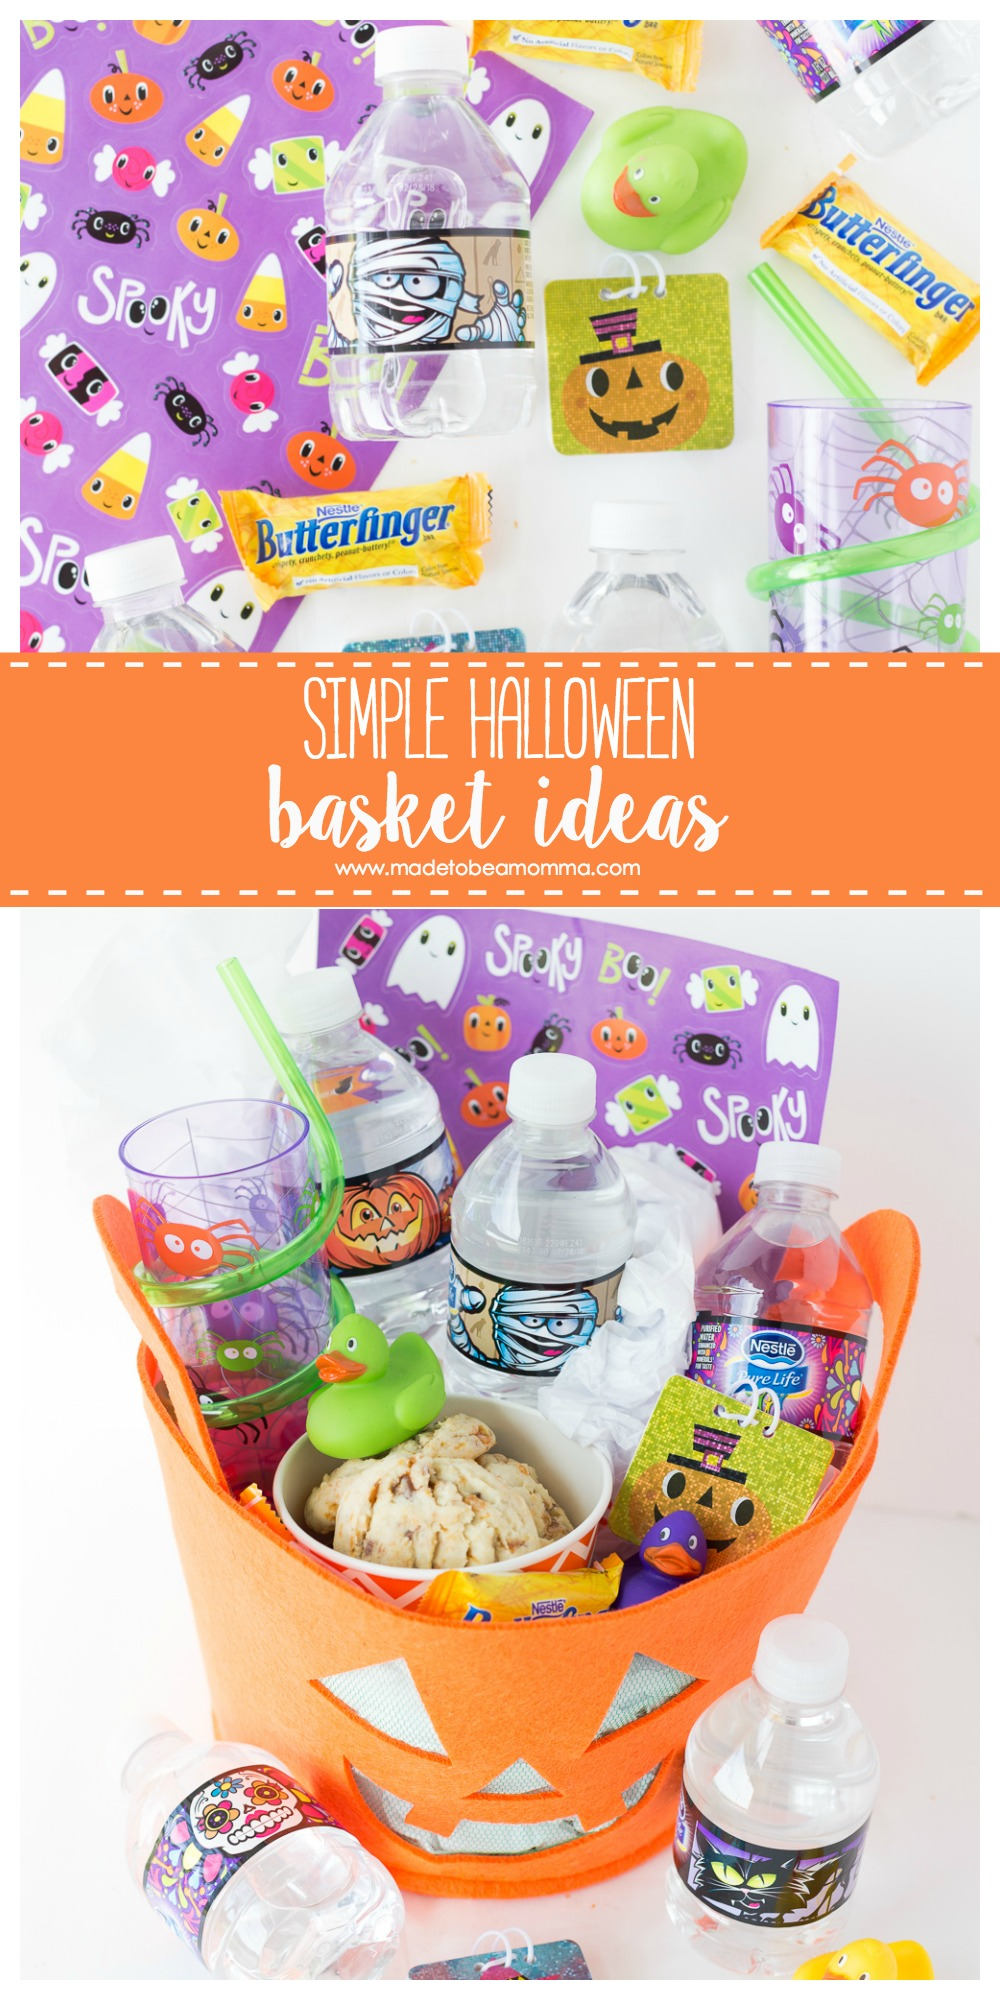 Simple Halloween Basket Ideas: www.madetobeamomma.com